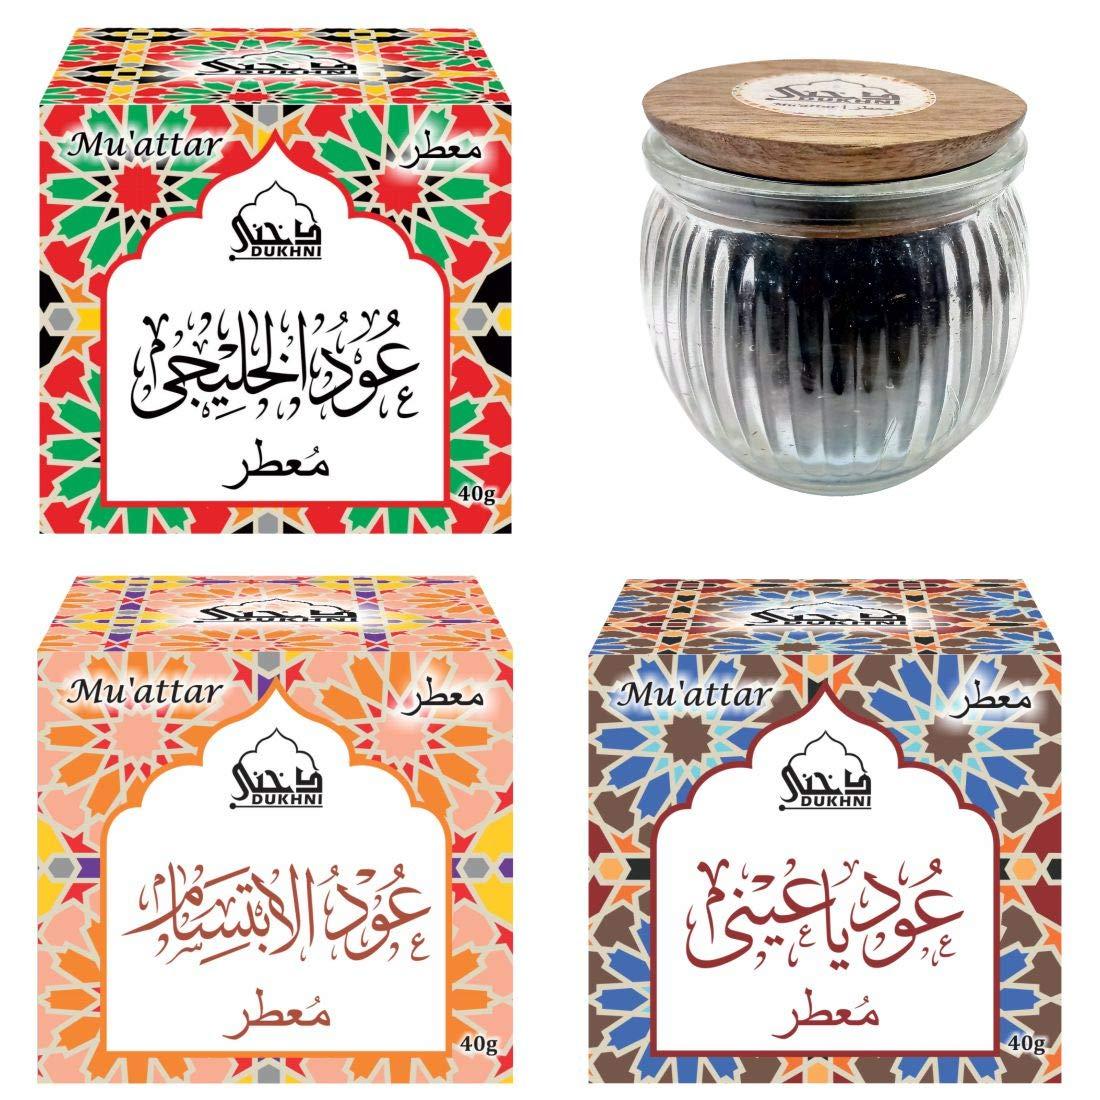 Dukhni Muattar Bakhoor - Oud Ya Aini, Oud Al Khaleeji, Oud Al Ibtisam. 3 x 40g Jars of Authentic Arabic BAKHOOR Incense - Wood Chips. Perfect for Prayer, Ceremony, Meditation, Relaxation by Dukhni